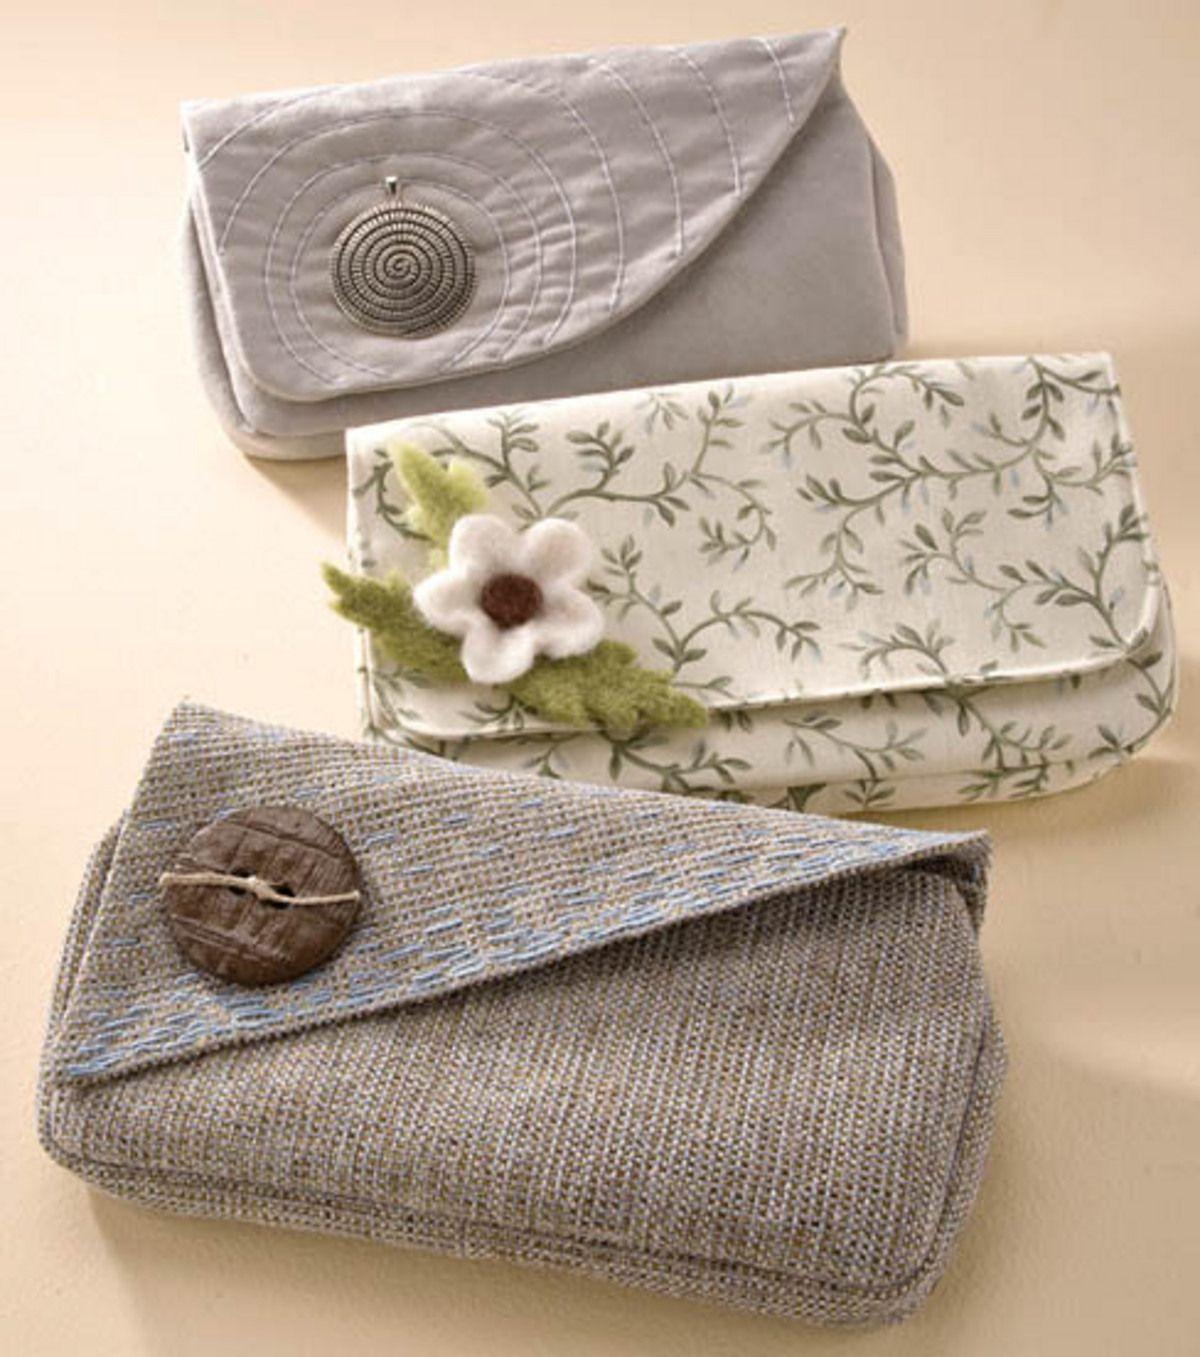 Personalized Clutch Purse & Apparel Fabric Accessories at Joann.com ...